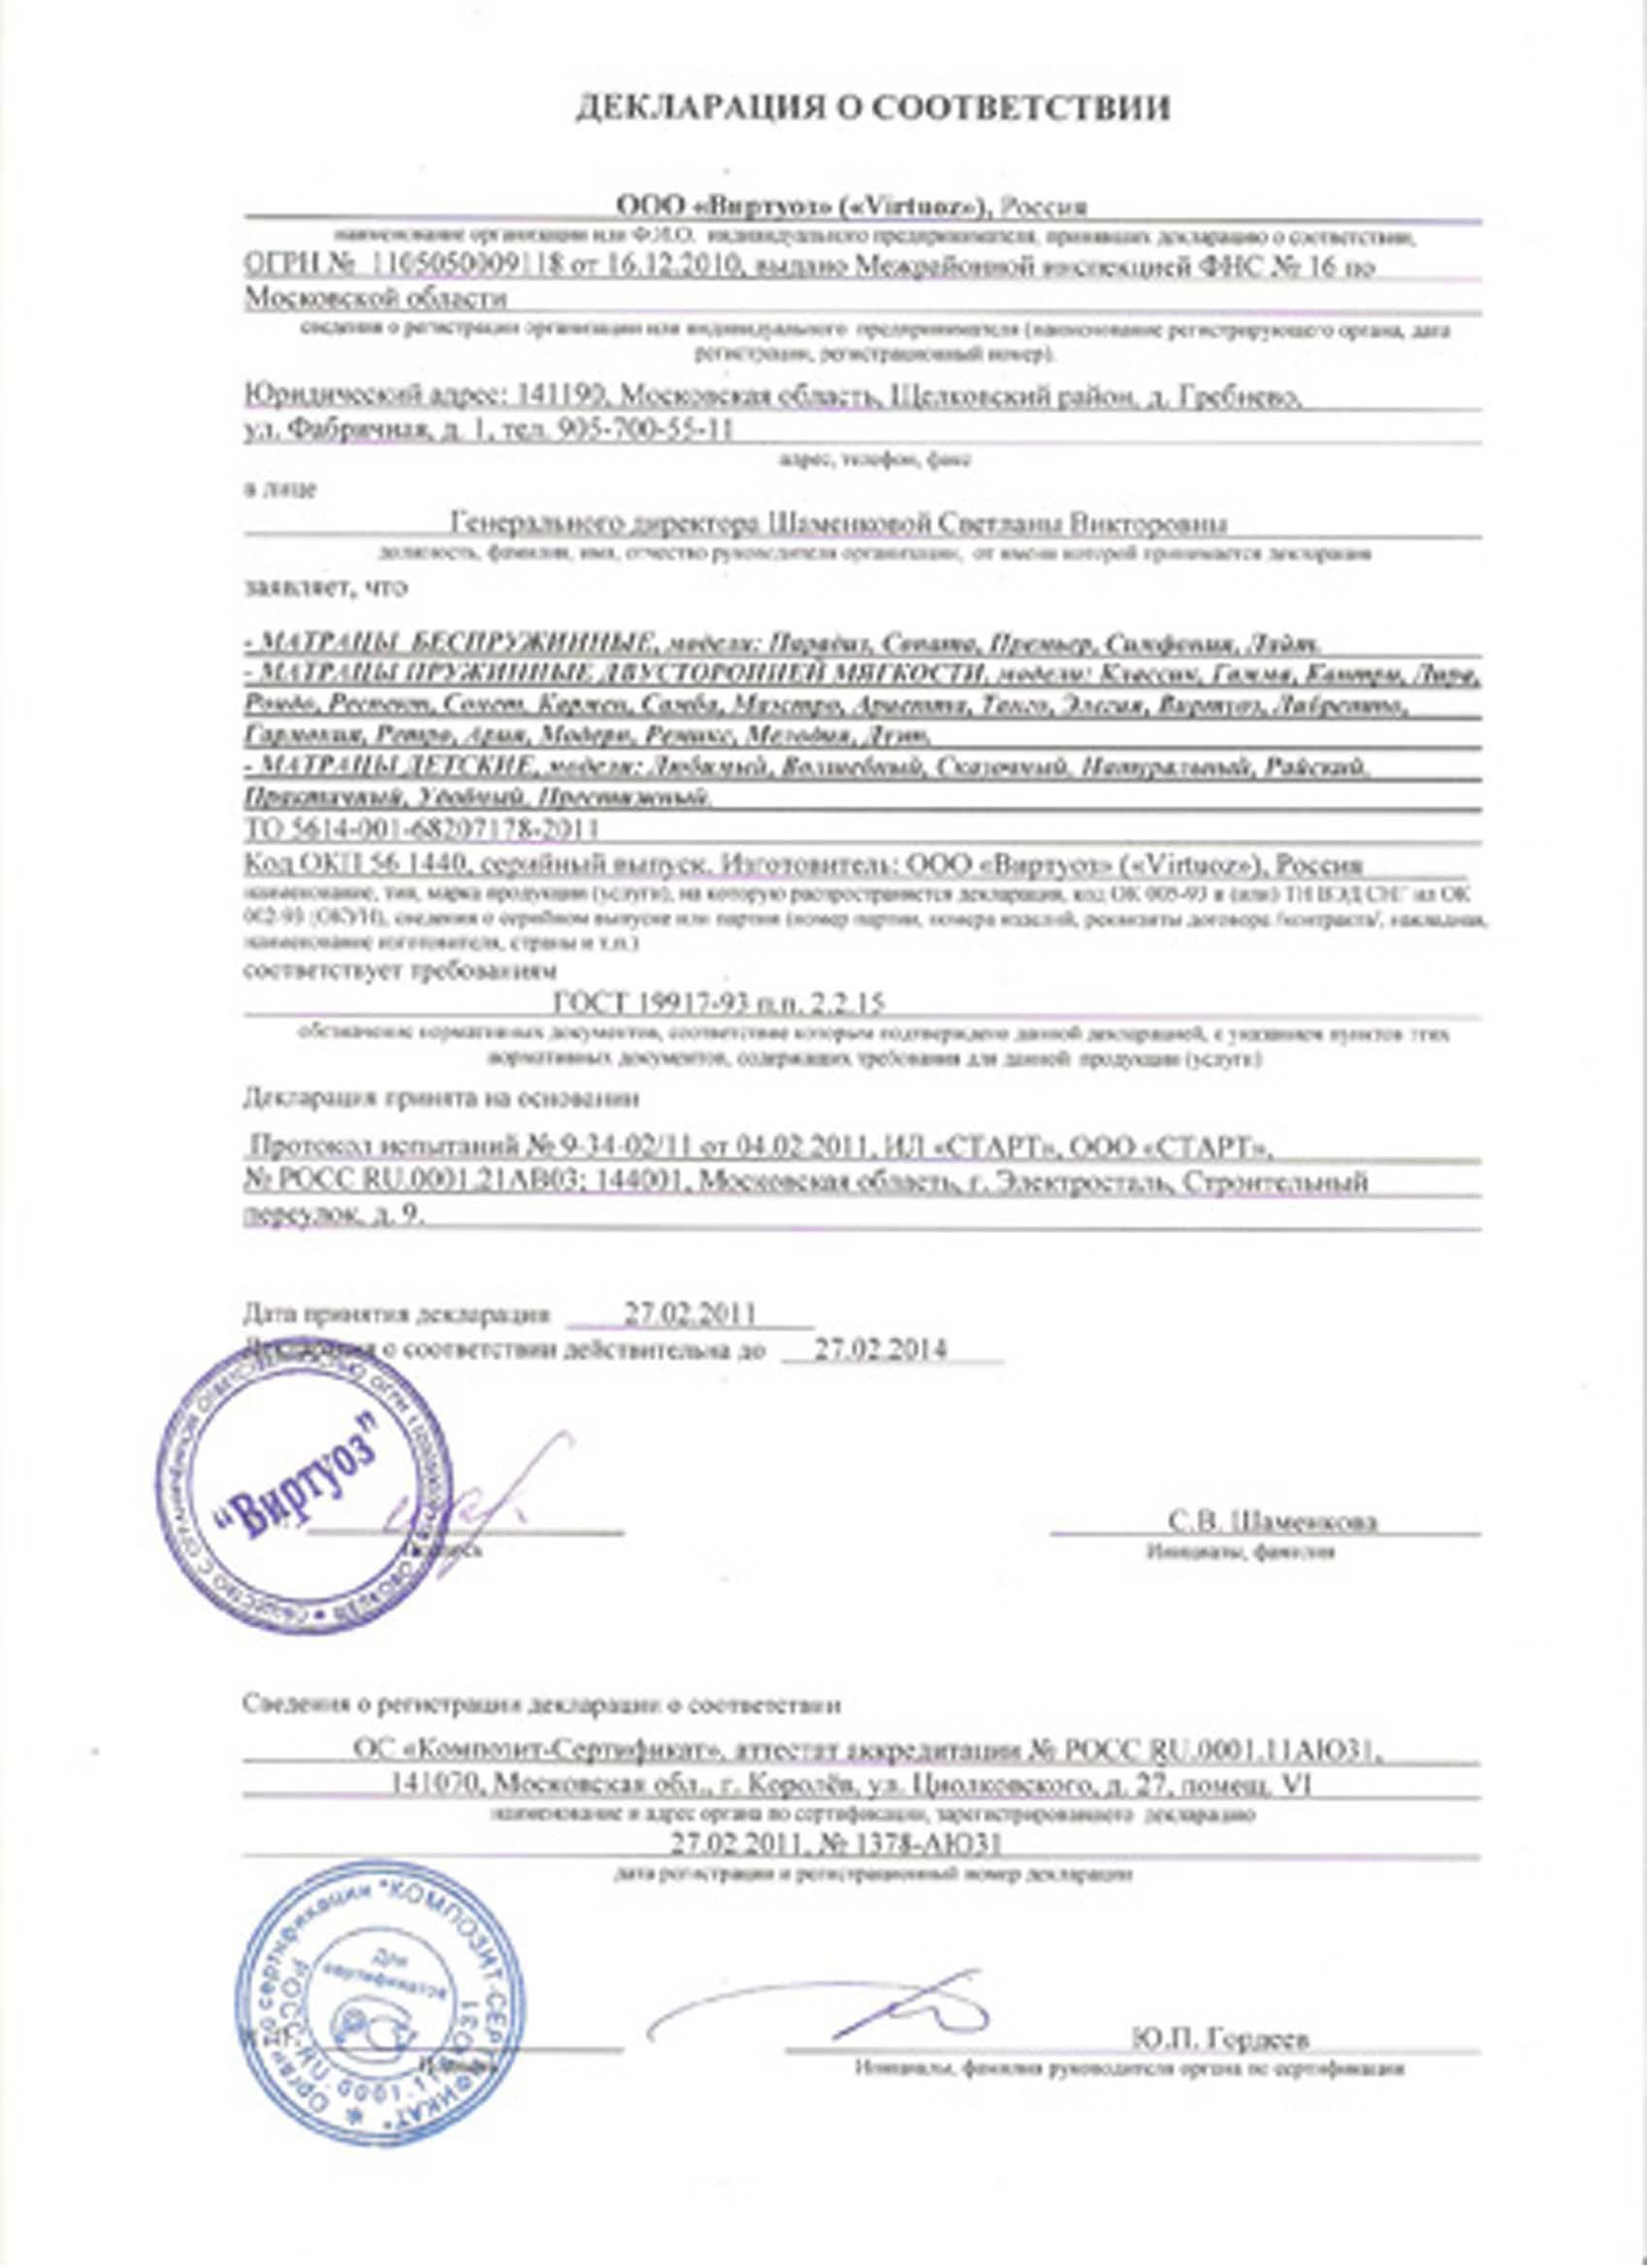 deklaraciya_sootvetstviya.jpg